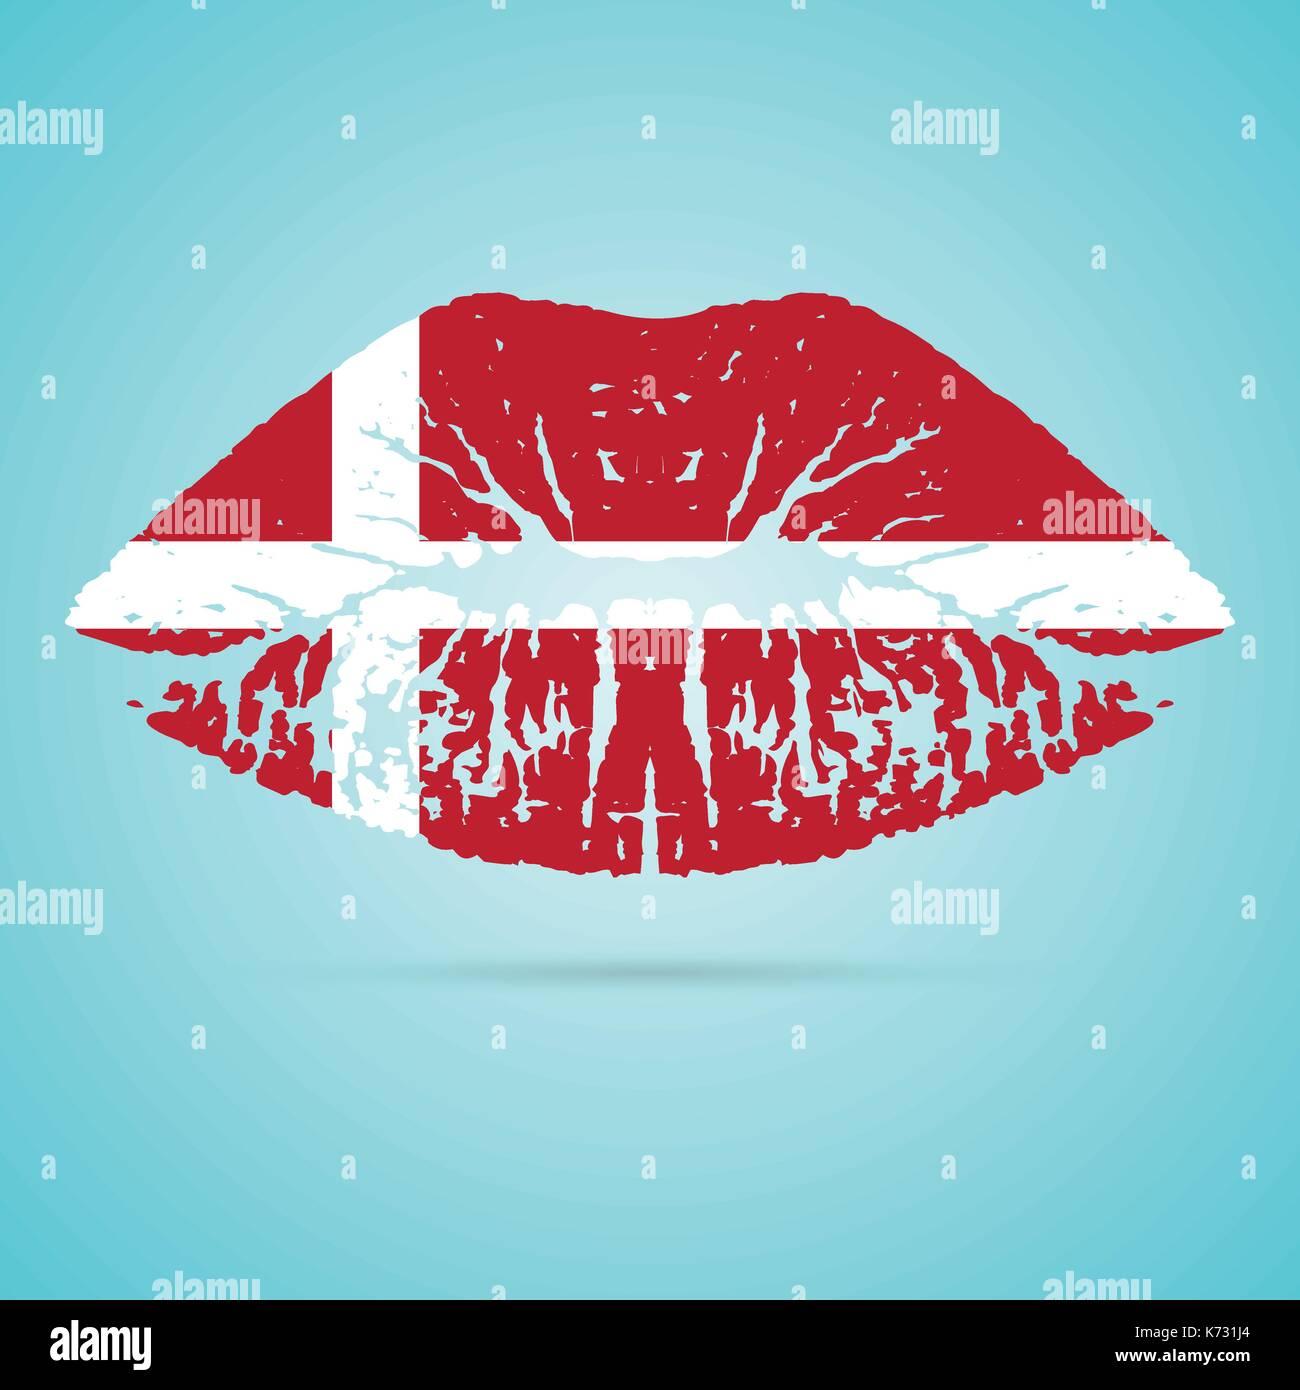 Denmark Flag Lipstick On The Lips Isolated On A White Background. Vector Illustration. - Stock Vector